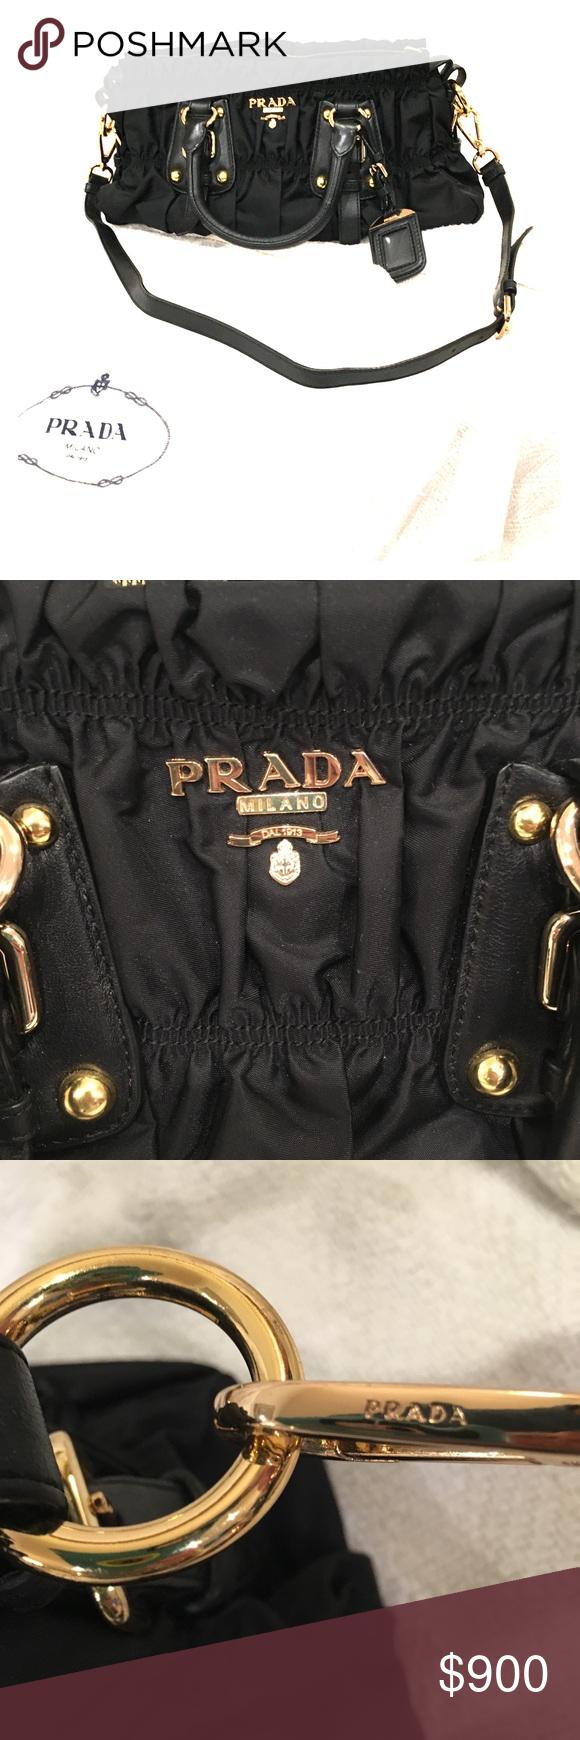 a7ba643a0ea9 ... purchase authentic prada tessuto gaufre bag authentic prada womens  shoulder tote bag tessuto gaufre nero.